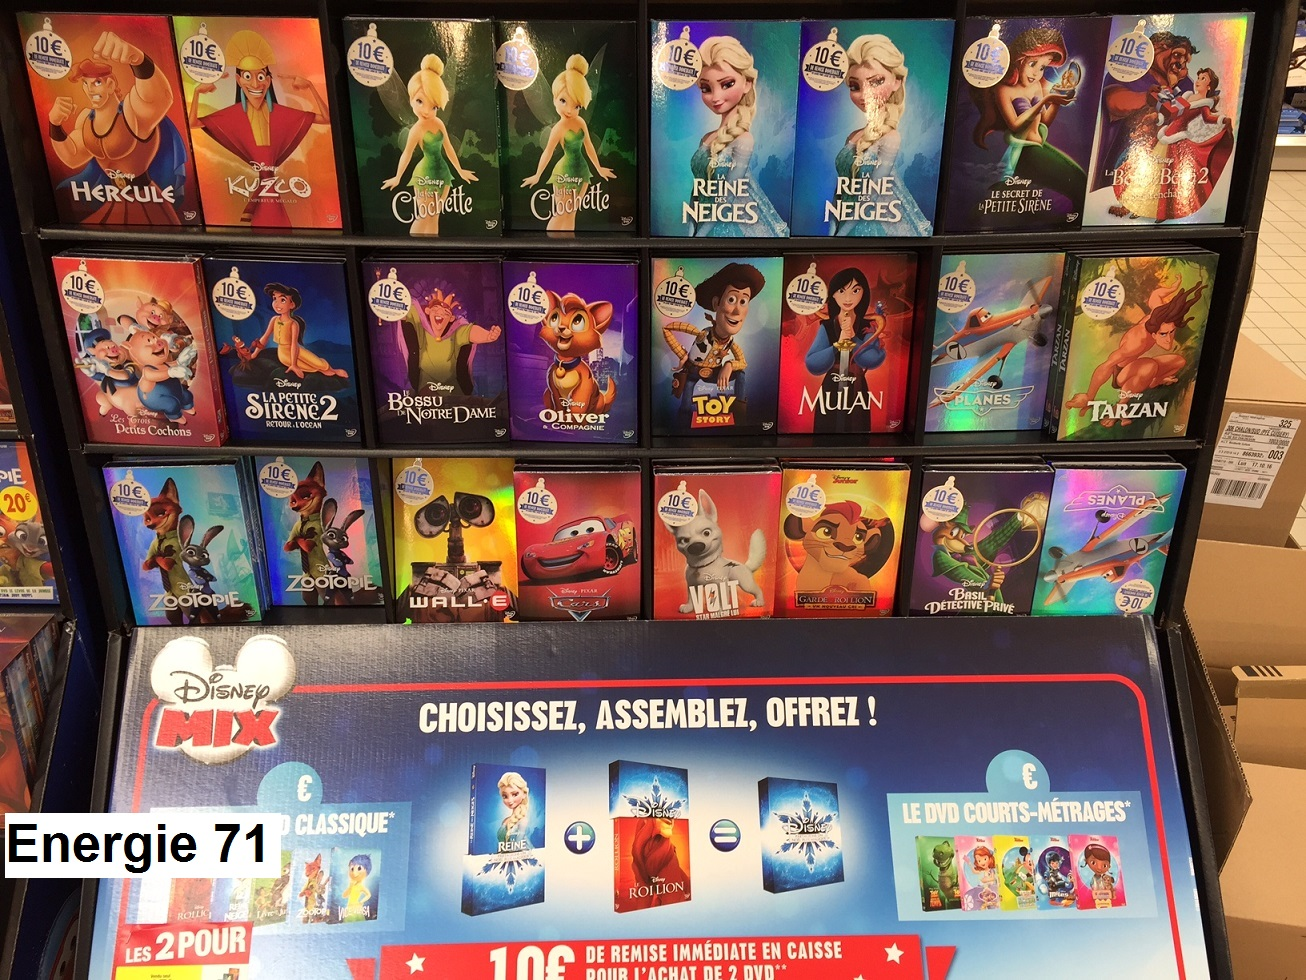 [Bons plans] DVD et Blu-ray Disney pas chers - Page 9 161017080147384316